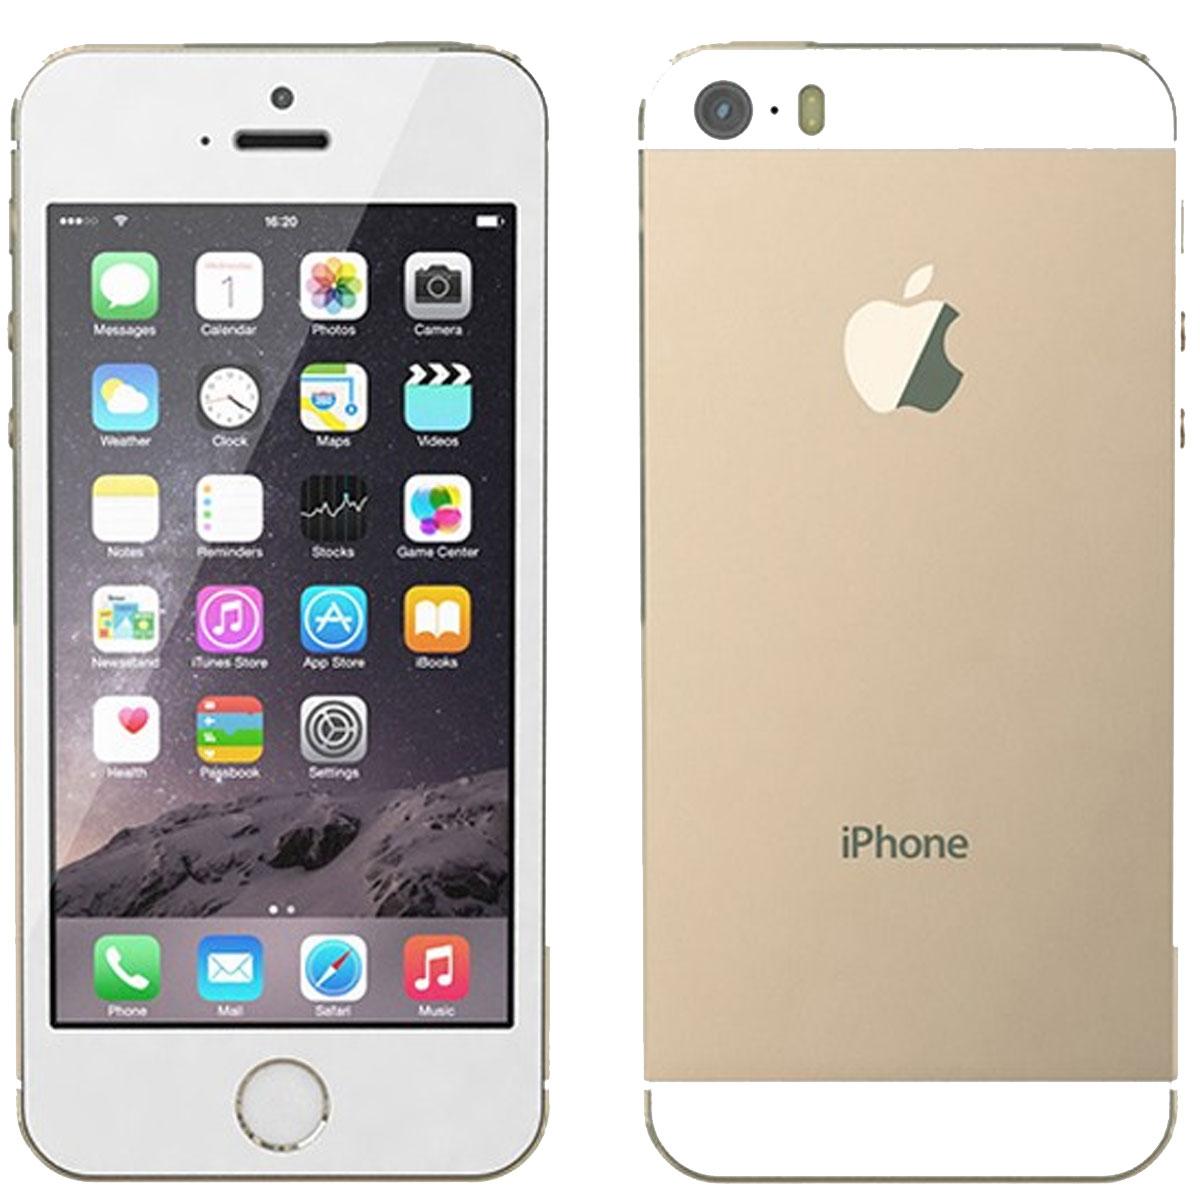 Apple iPhone 5s Price in Pakistan 2020 | PriceOye